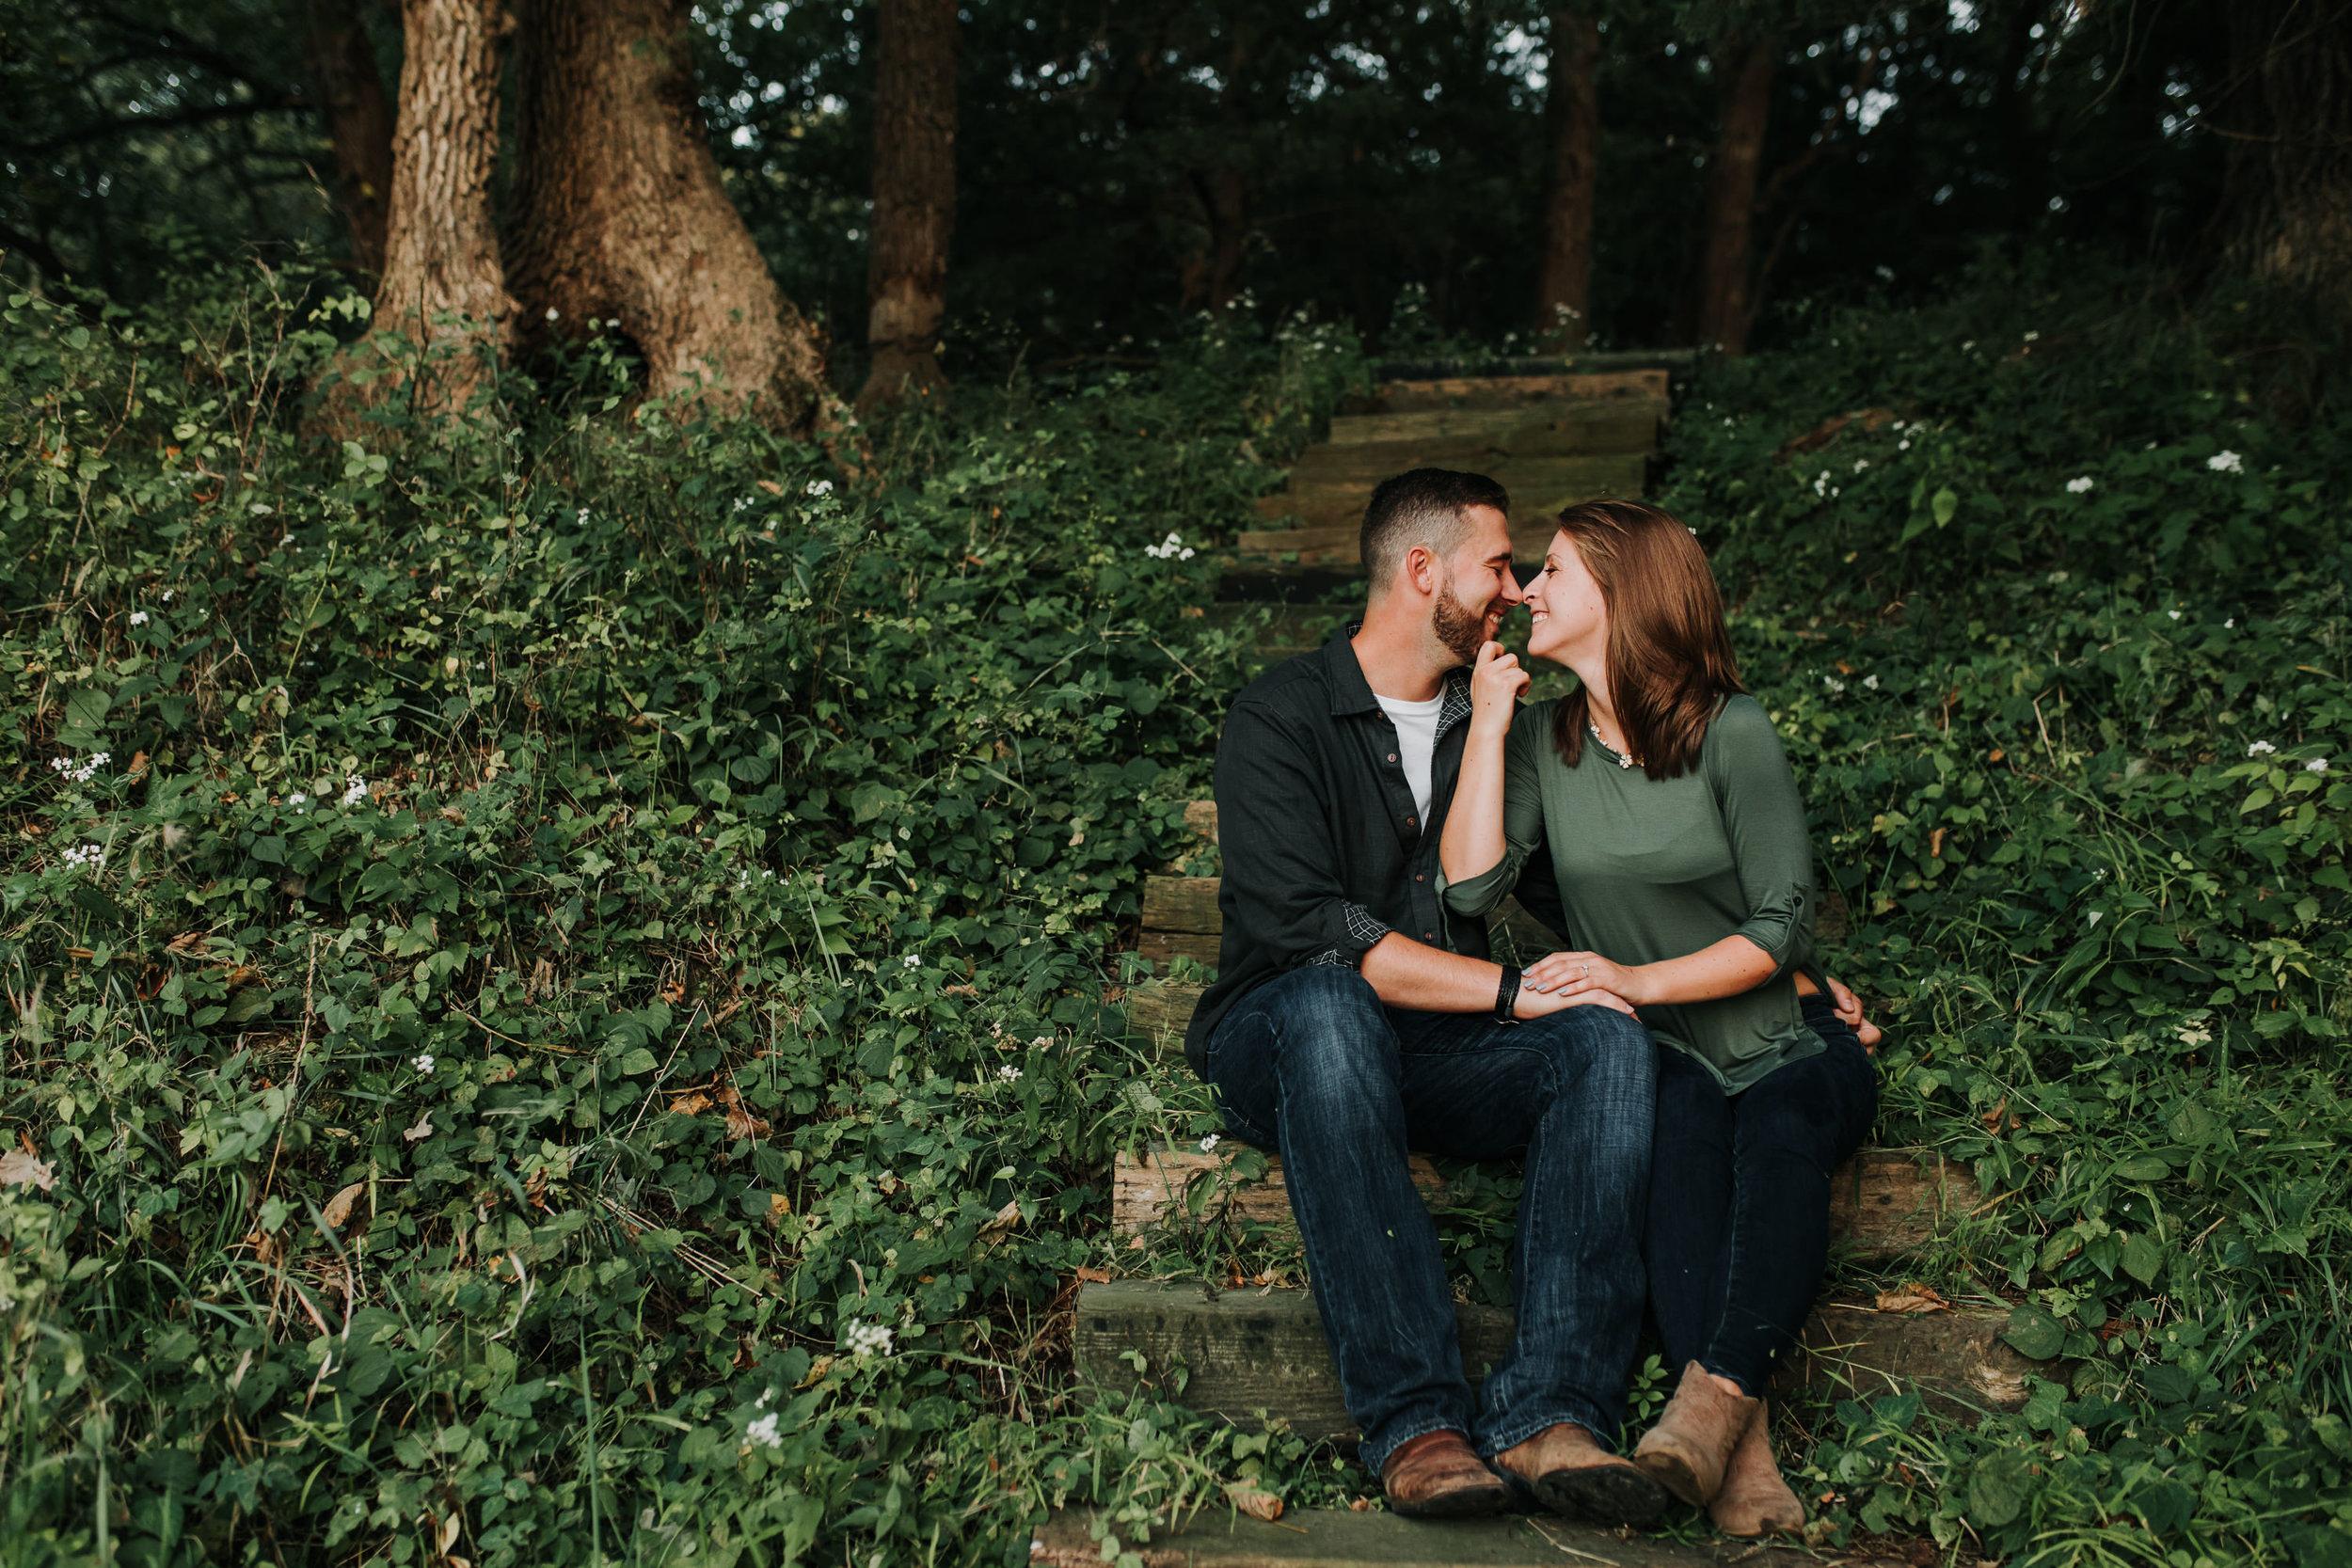 Leslie & Austin - Engaged - Nathaniel Jensen Photography - Omaha Nebraska Wedding Photograper - Engagement Session-92.jpg